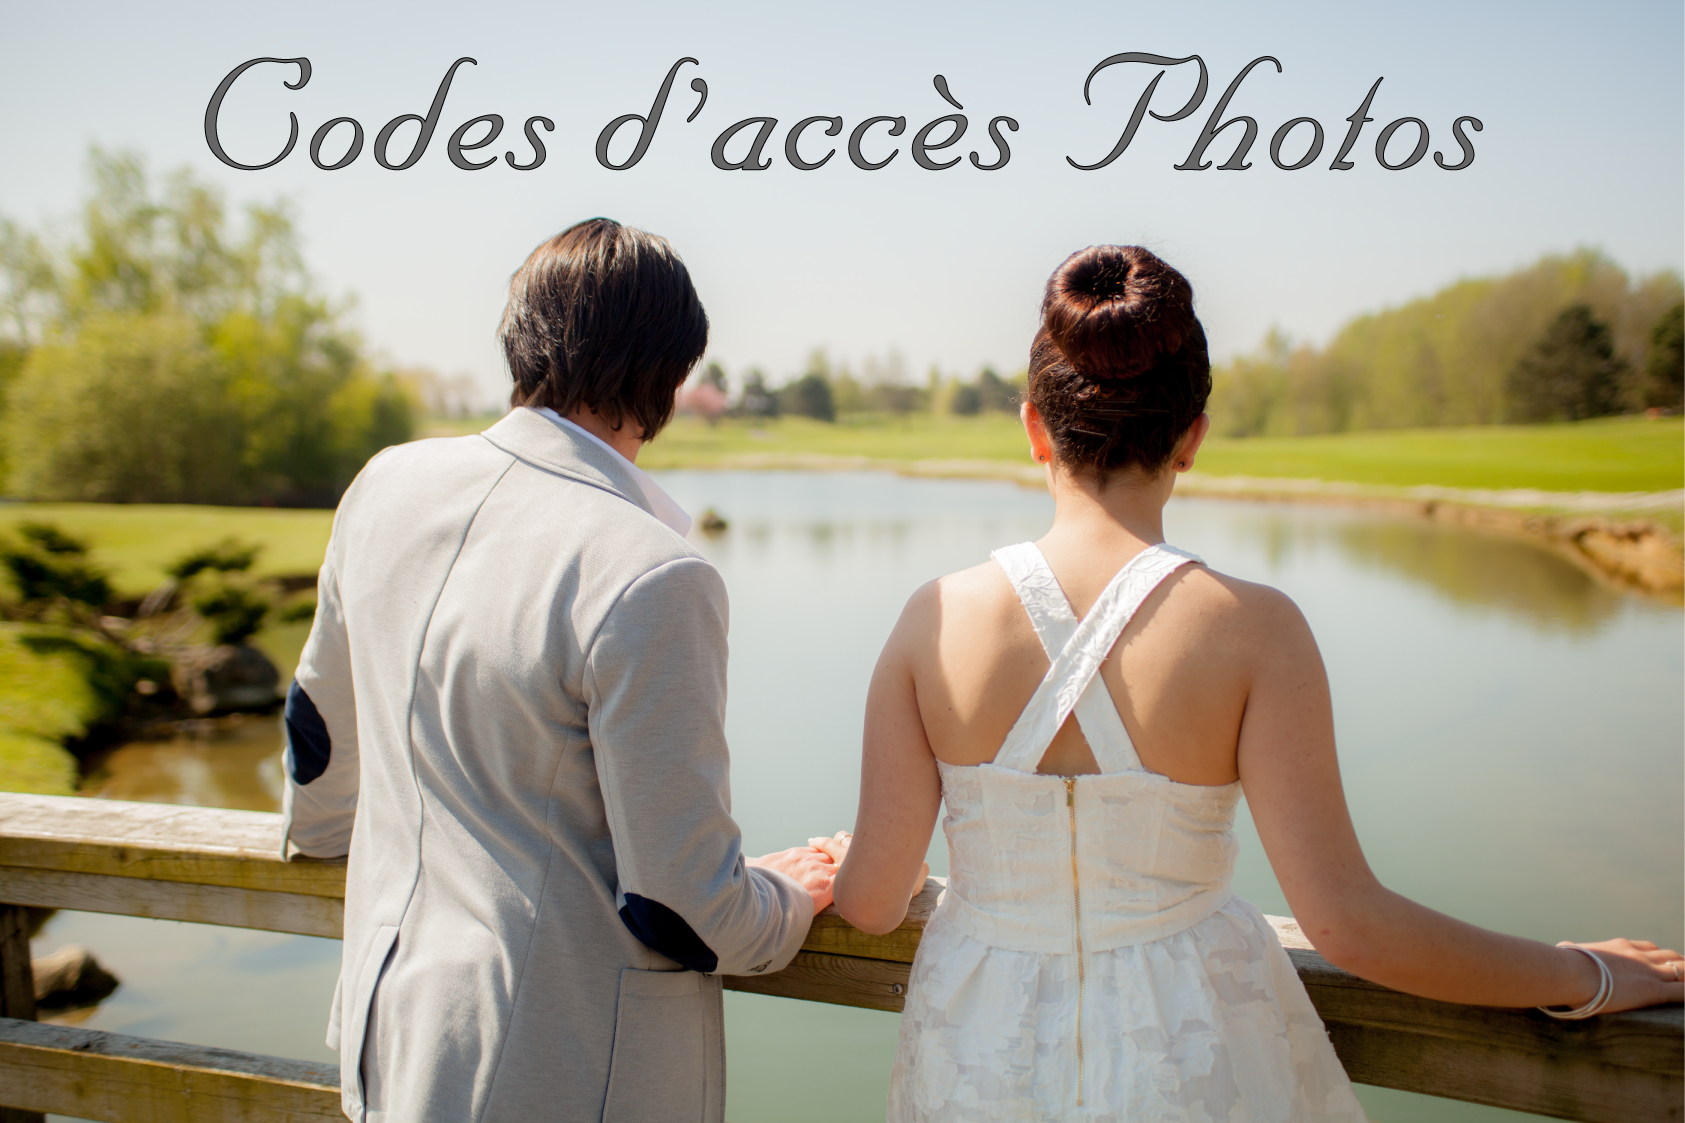 codes-d'accès-photos